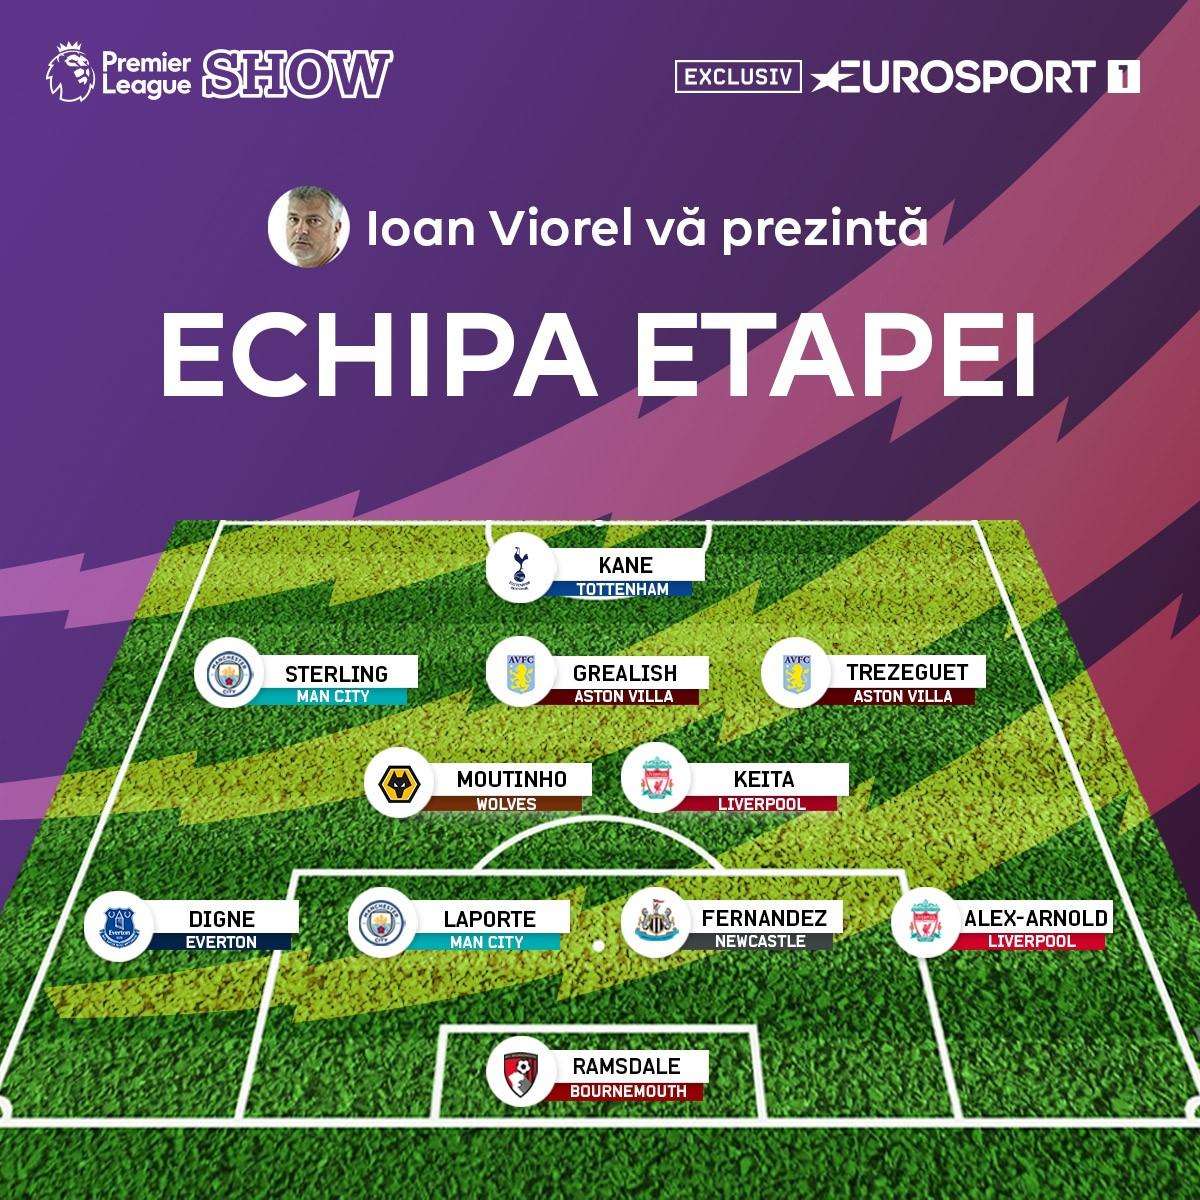 https://i.eurosport.com/2020/07/23/2854418.jpg